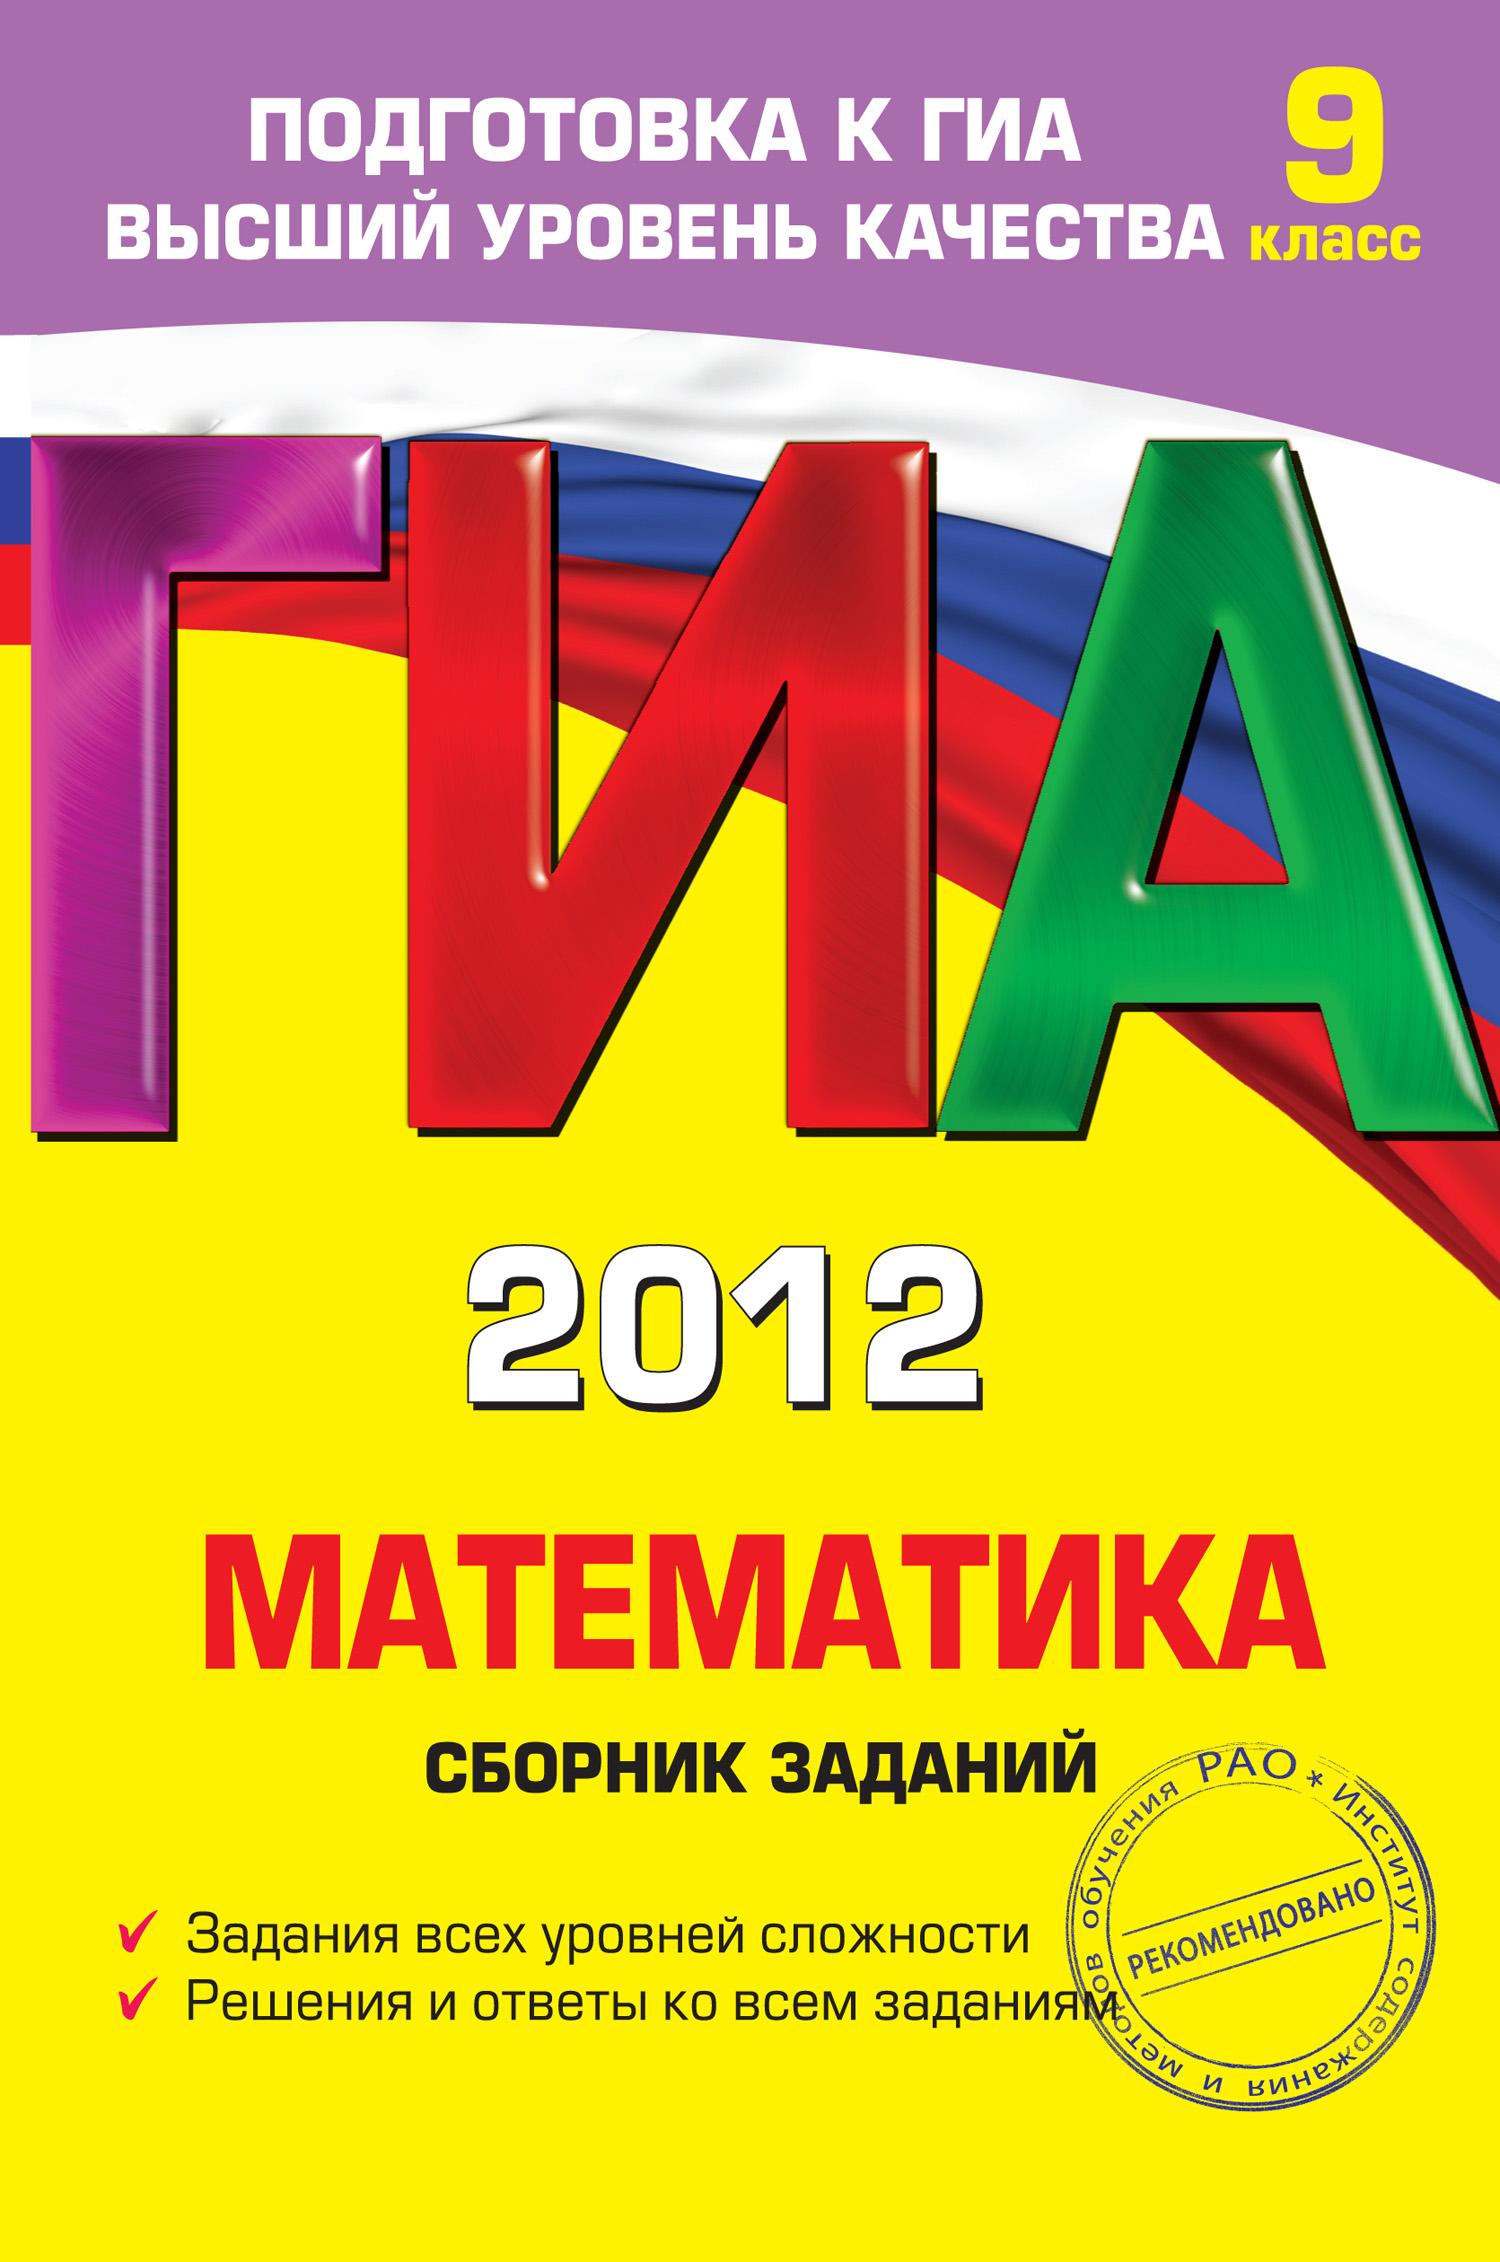 ГИА 2012. Математика. Сборник заданий. 9 класс